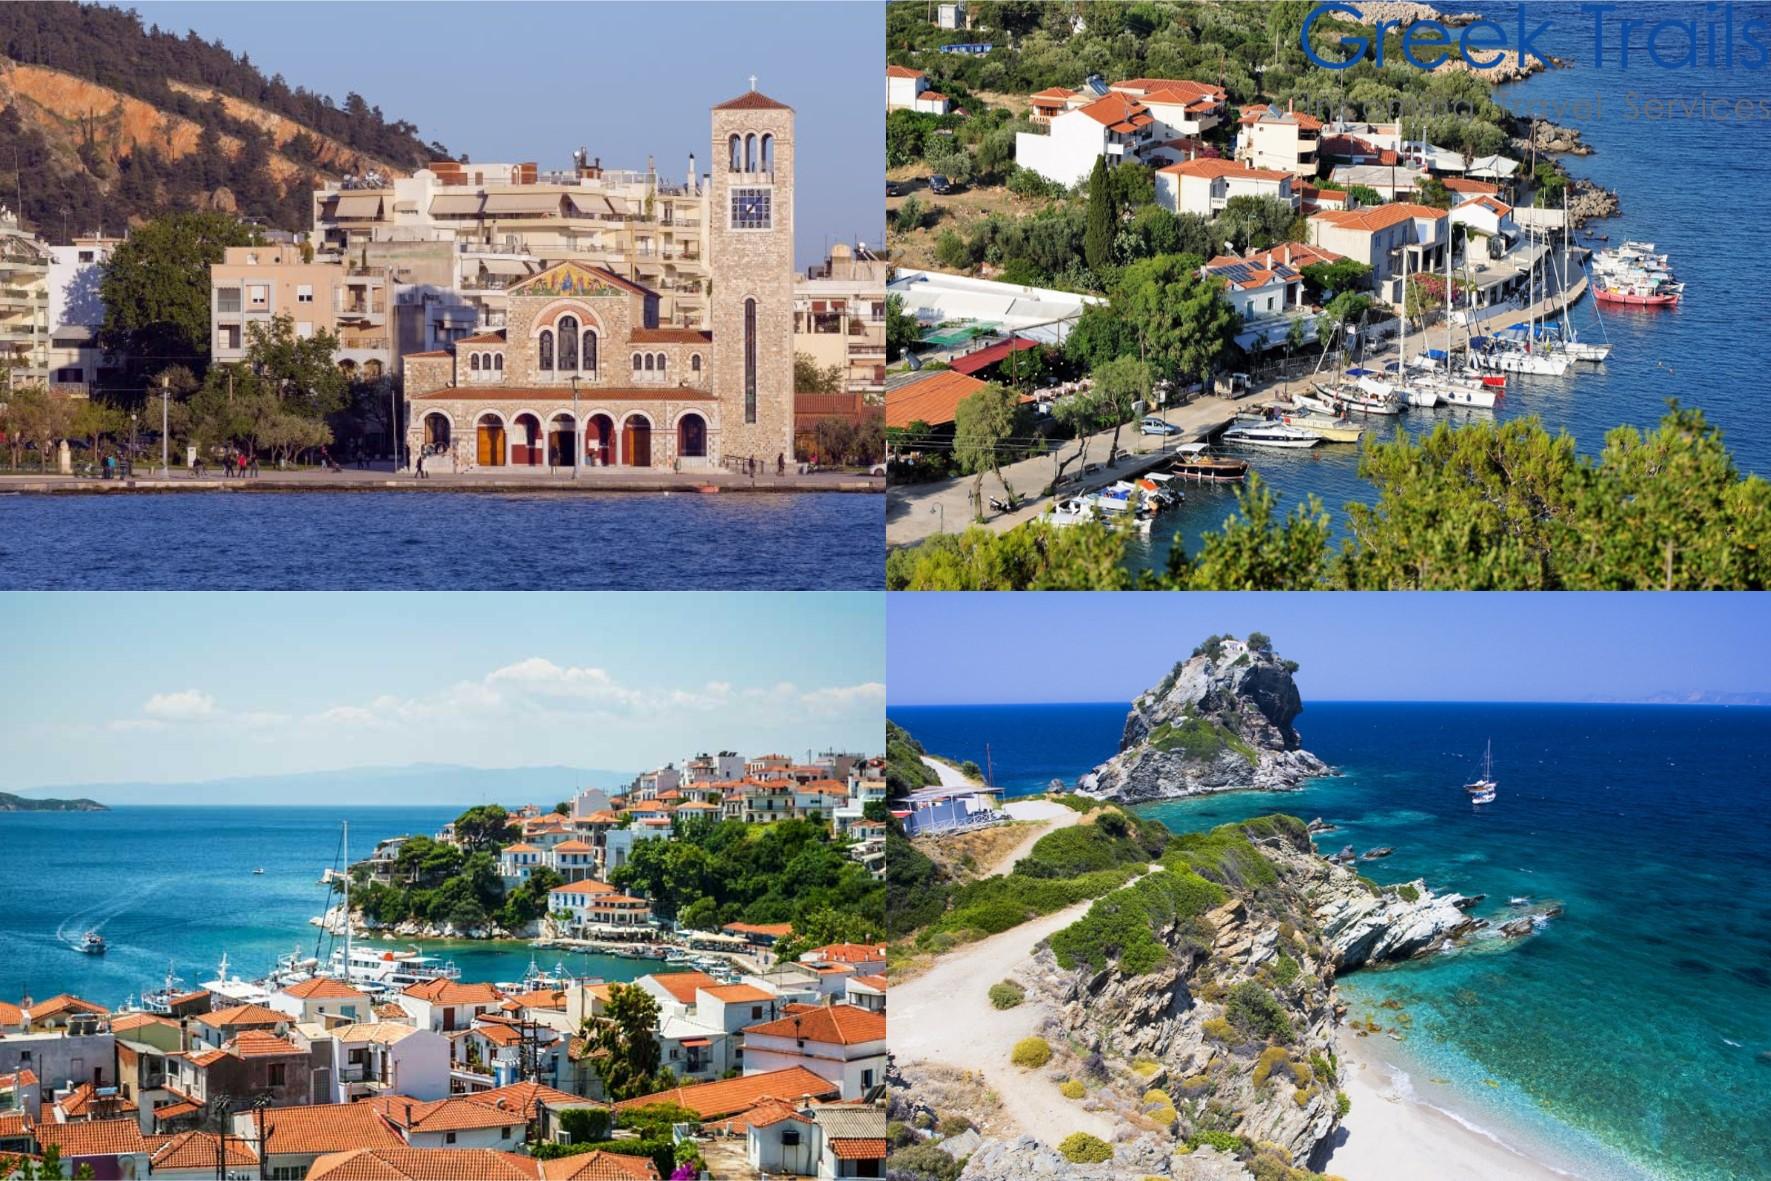 Volos – Skiathos – Skopelos – Alonissos